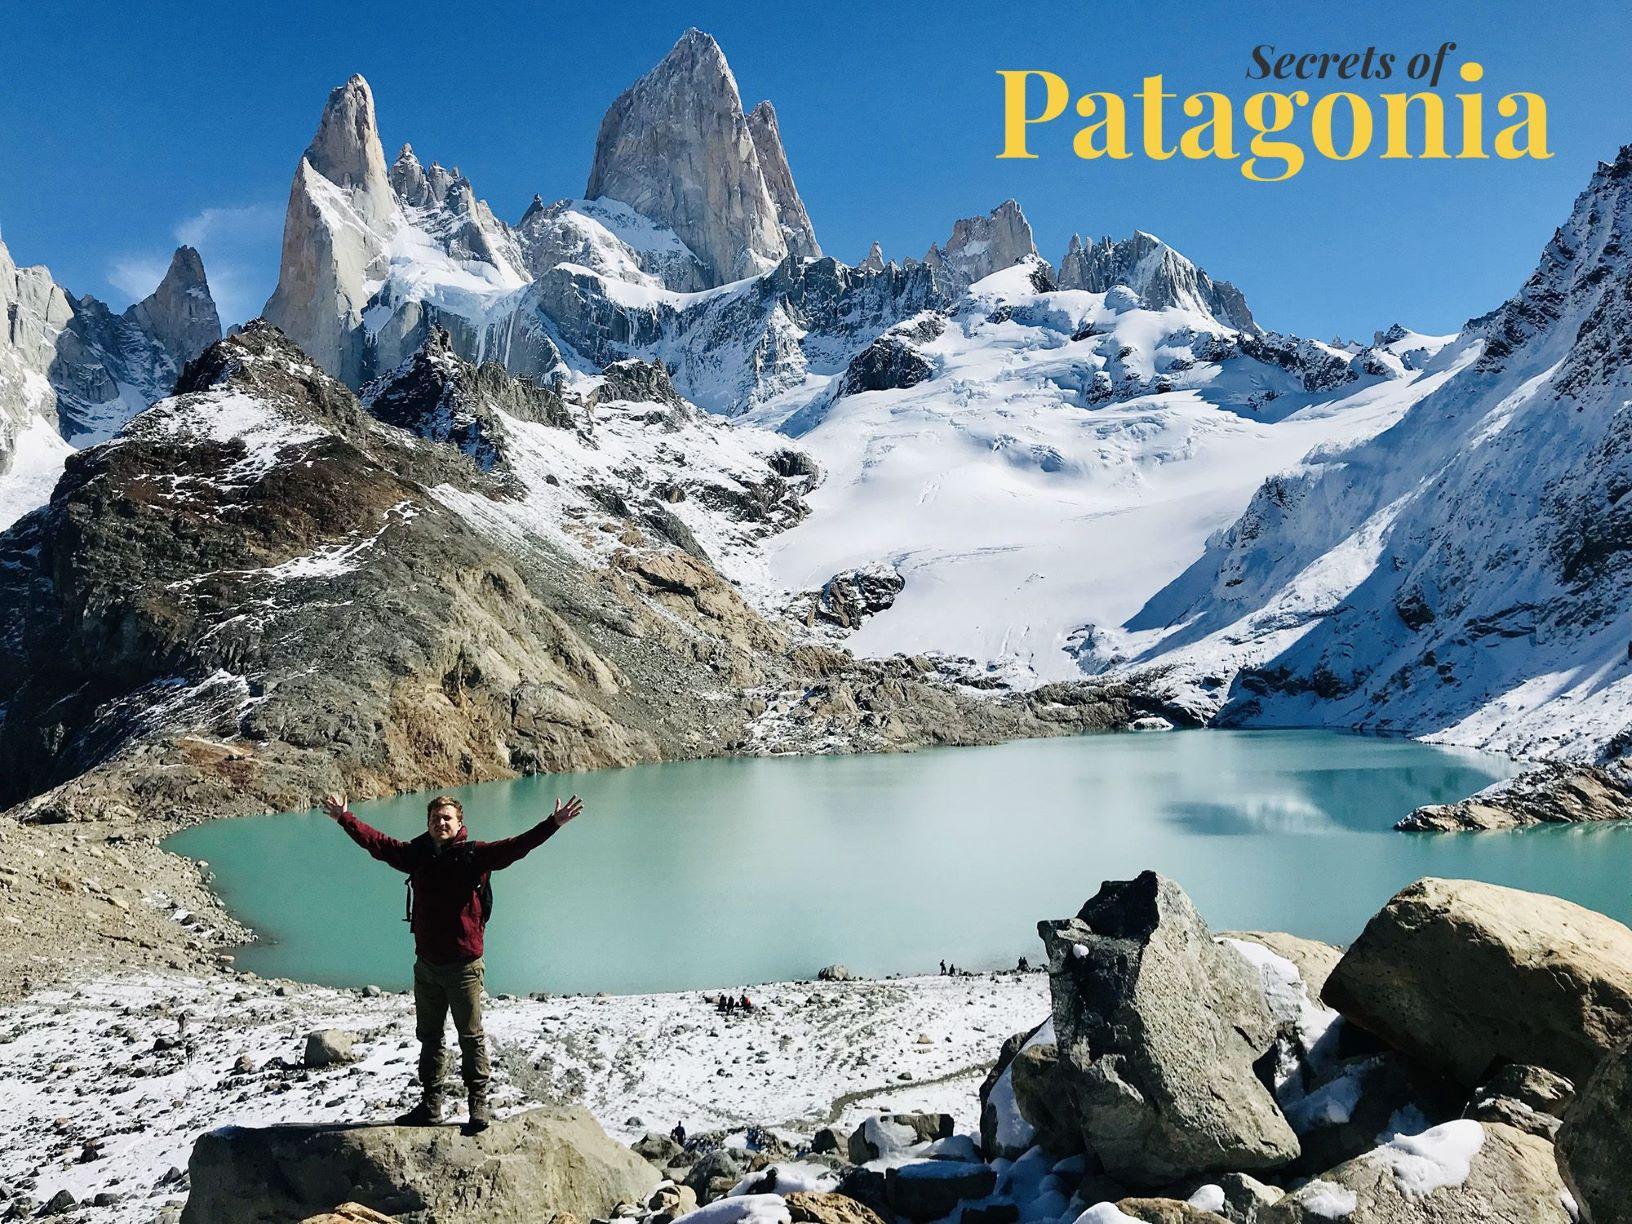 How many days in Patagonia El Chalten El Calafate Torres del Paine Puerto Madryn